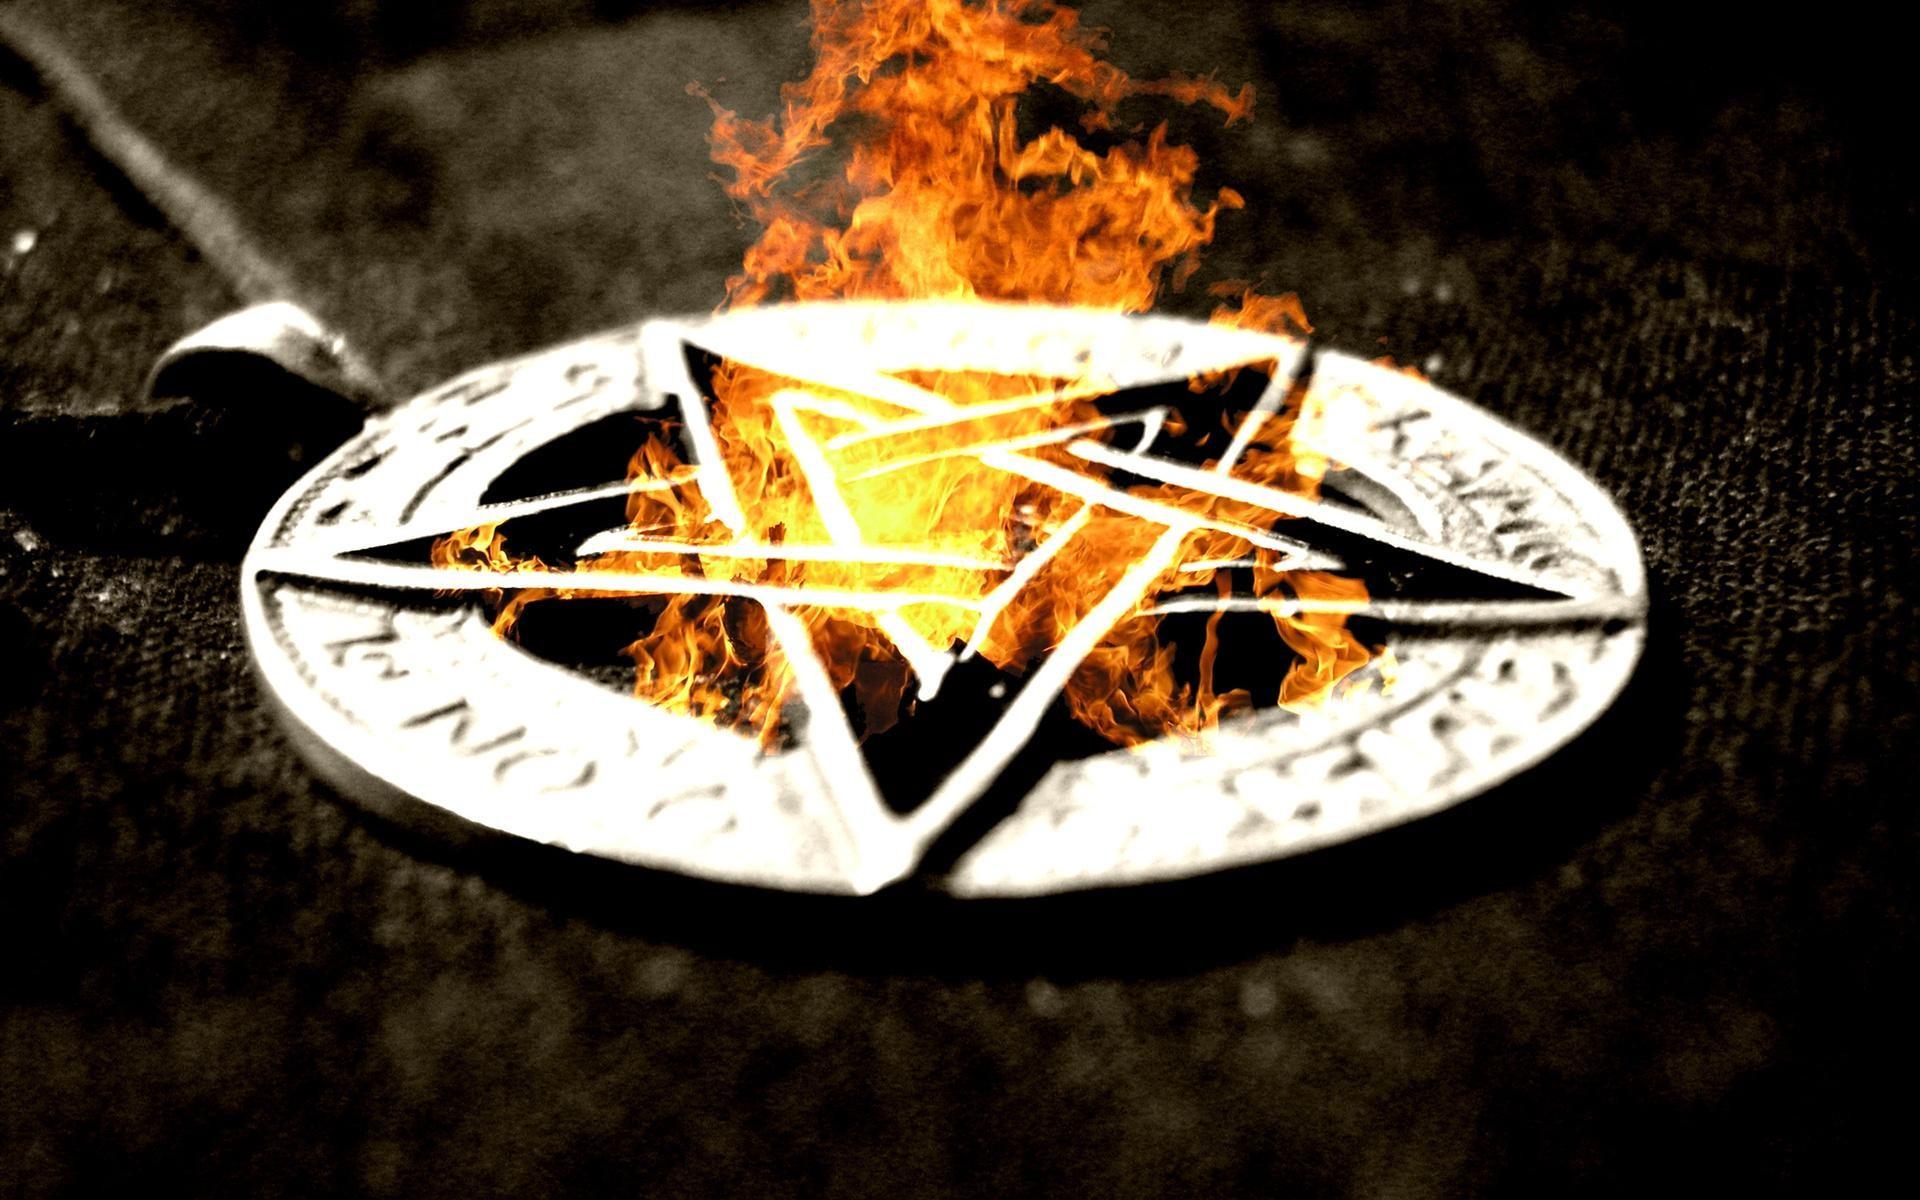 Res: 1920x1200, Pentacle Fire pentagram occult dark evil satan wallpaper |  |  27923 | WallpaperUP